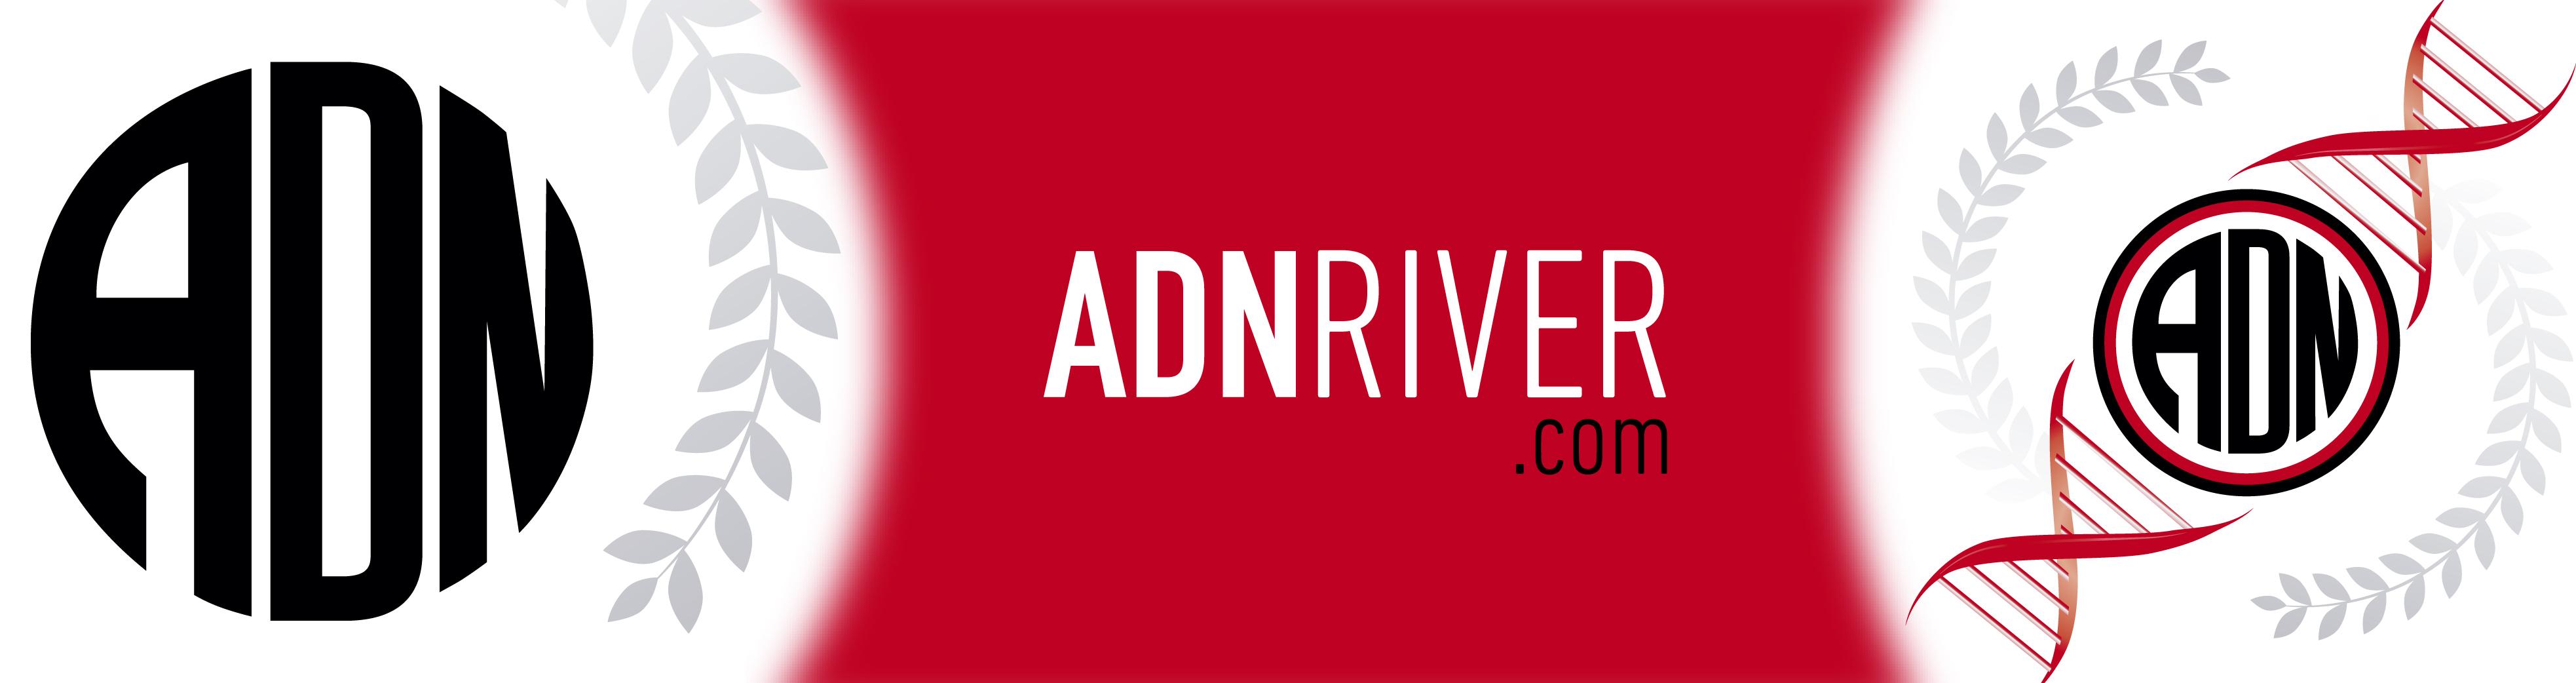 ADN River